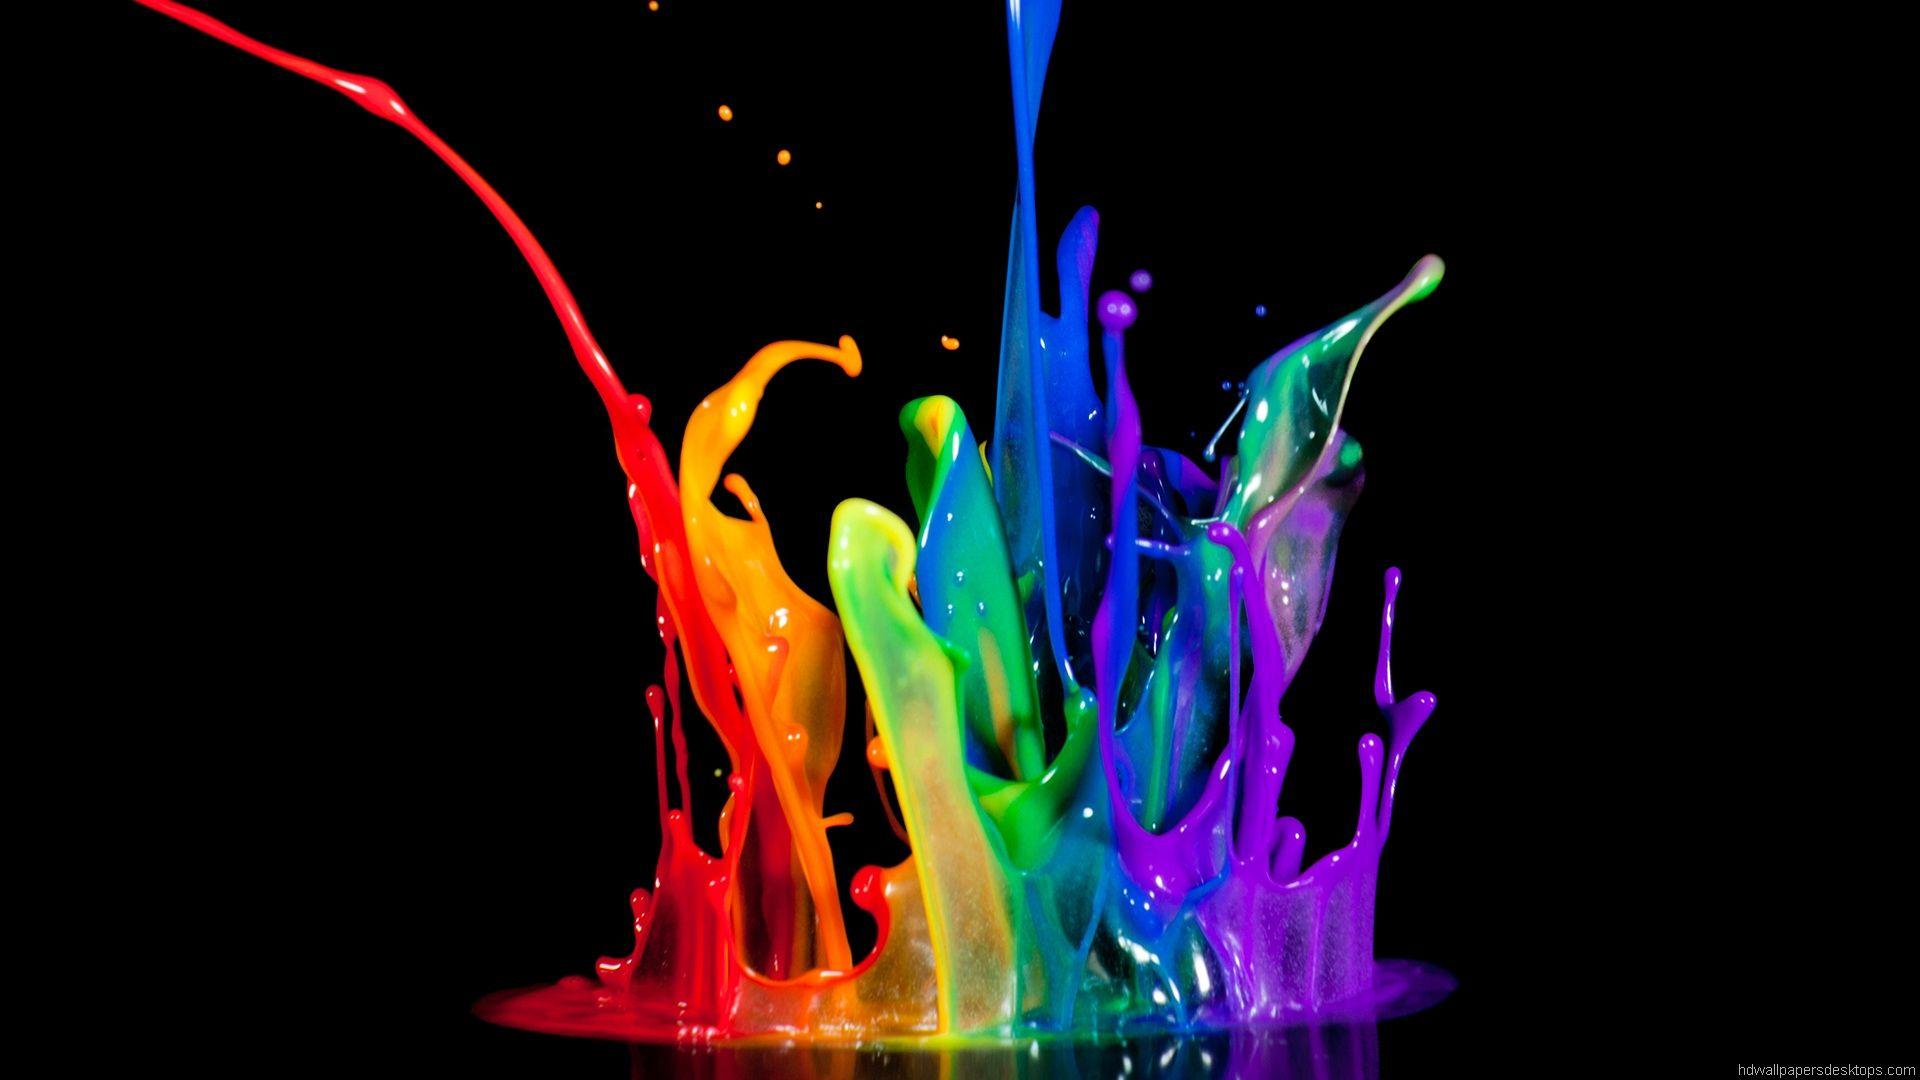 And Hq Stuff Rainbows Icp